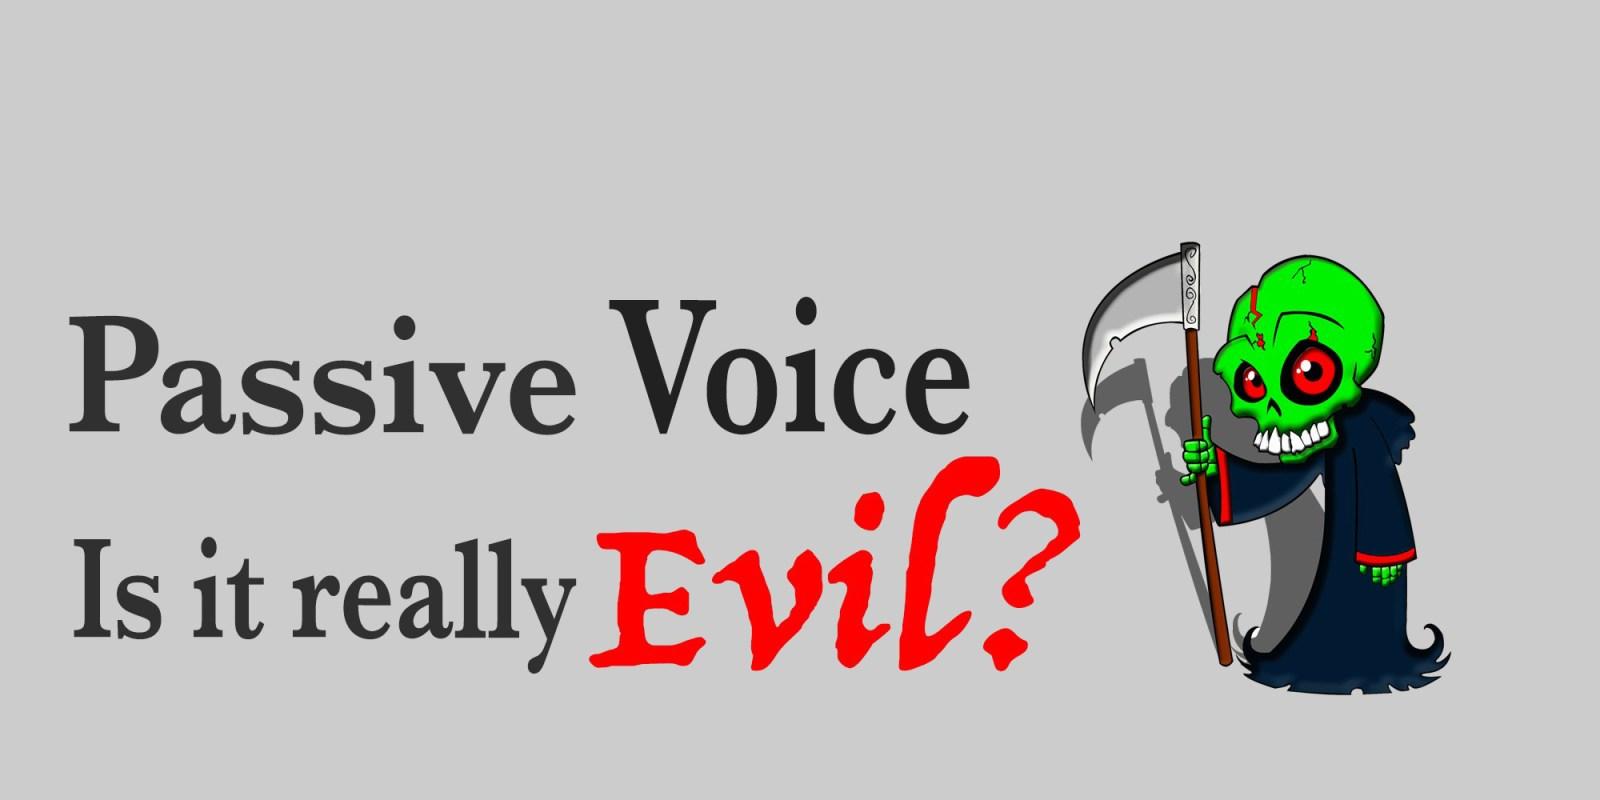 Passive voice isn't evil